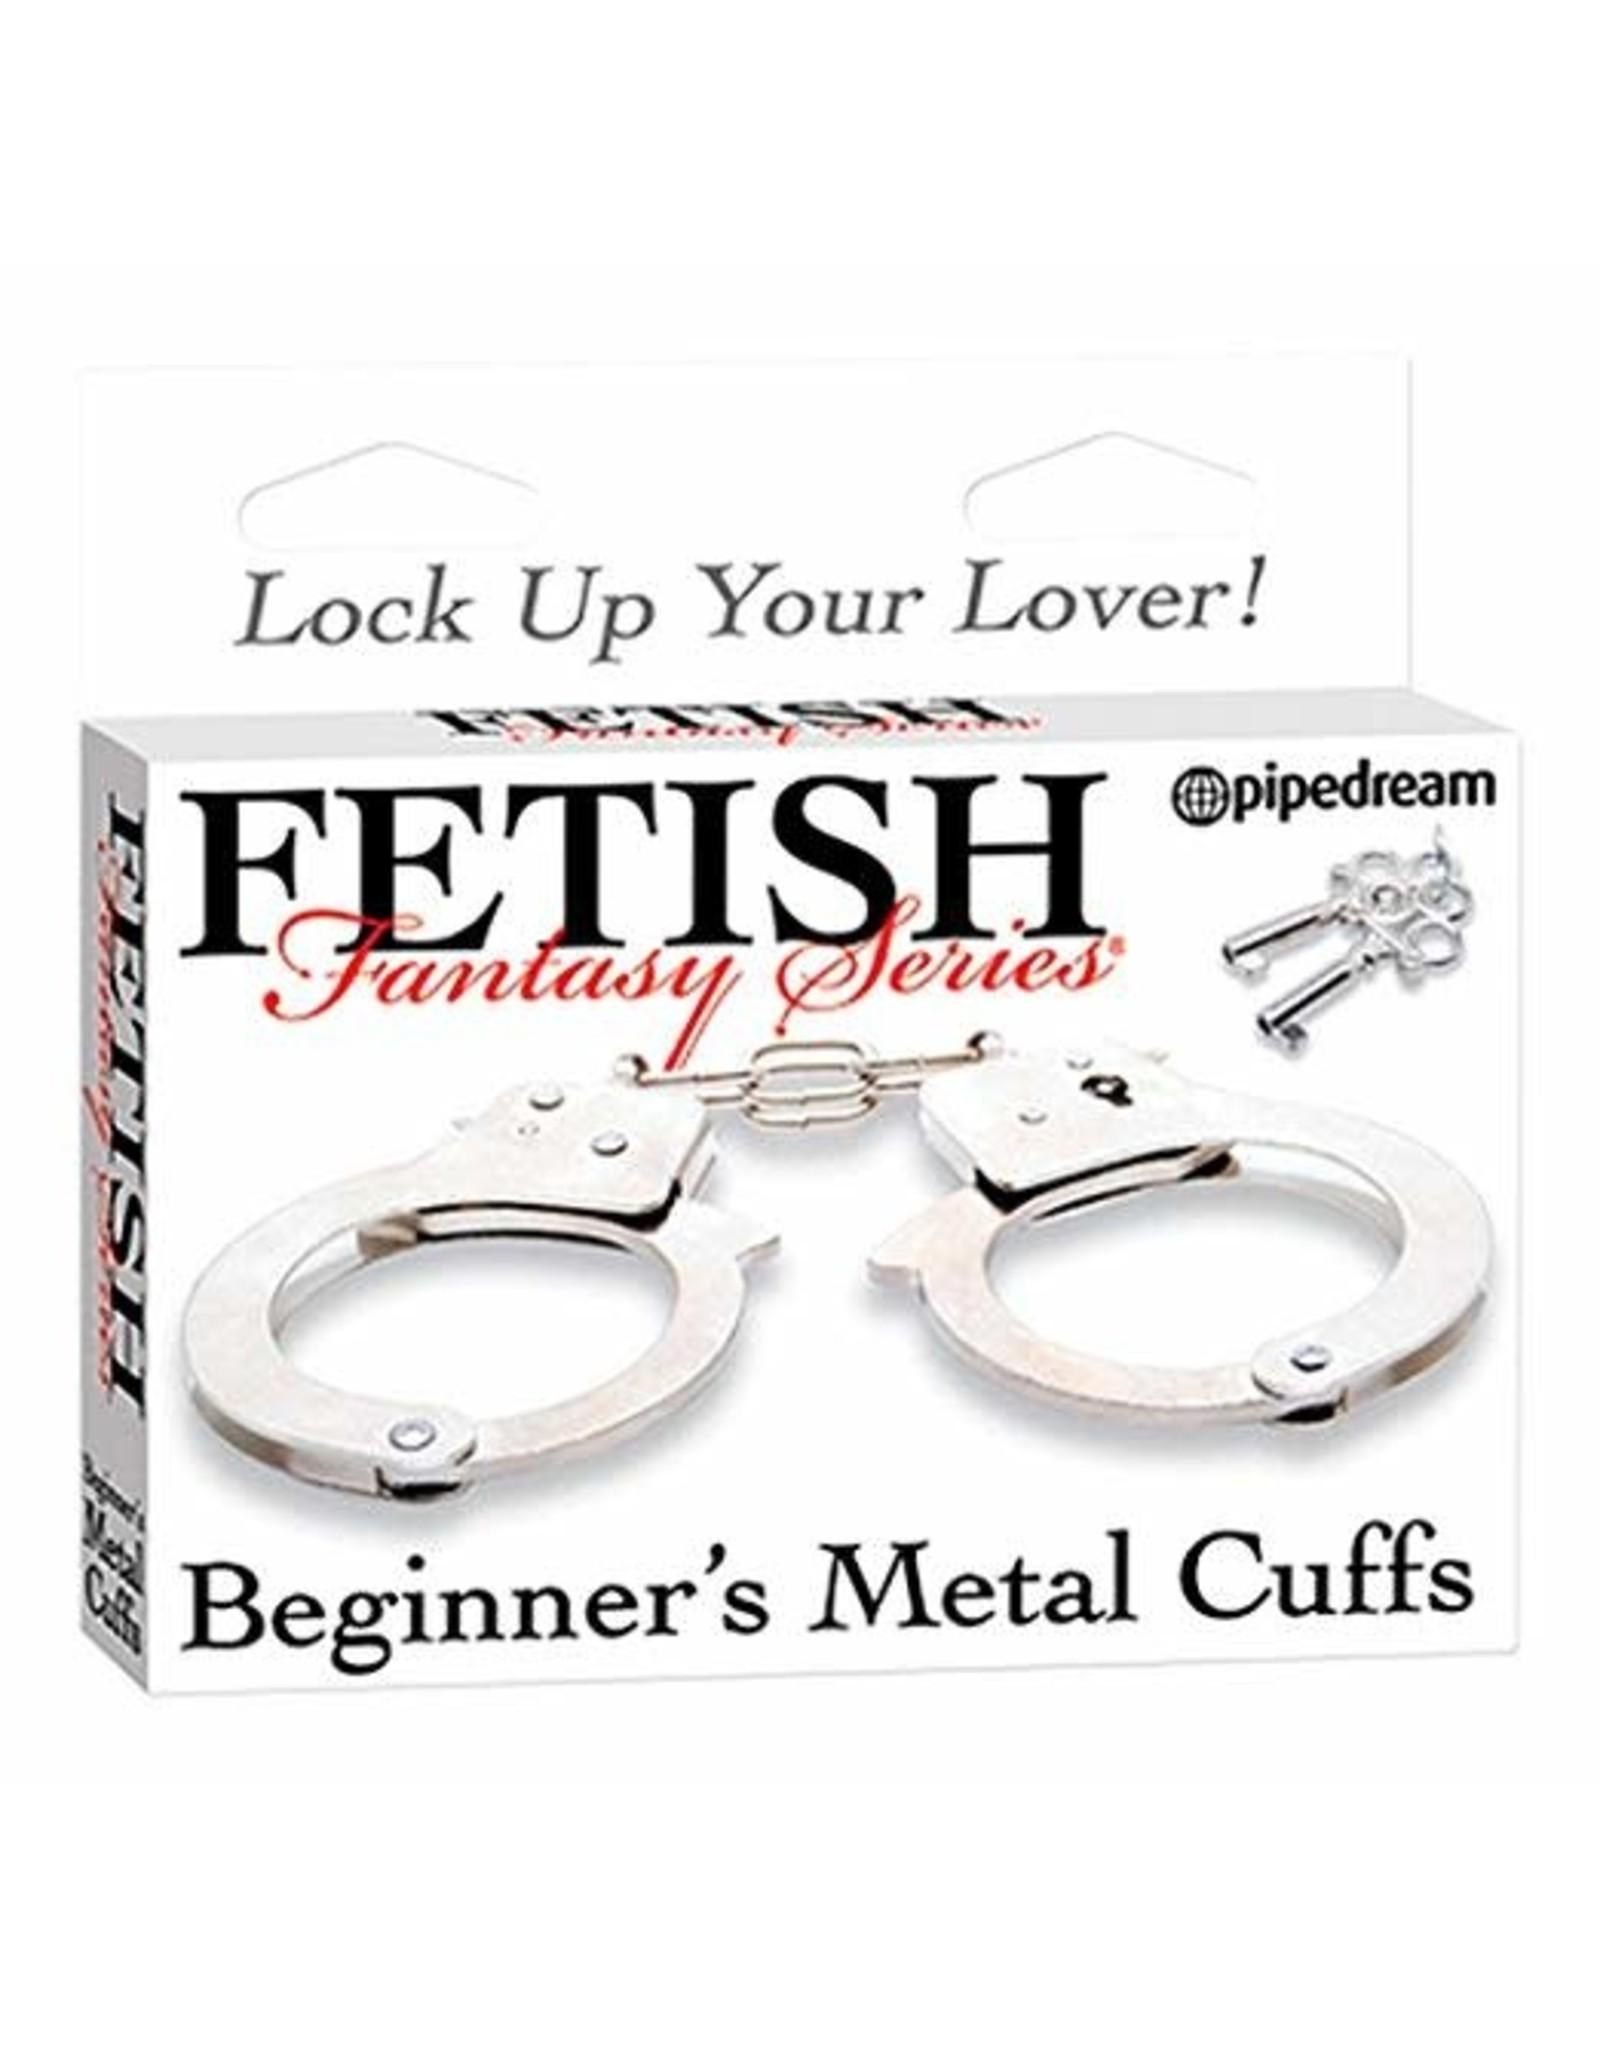 FETISH FANTASY - BEGINNER'S METAL CUFFS